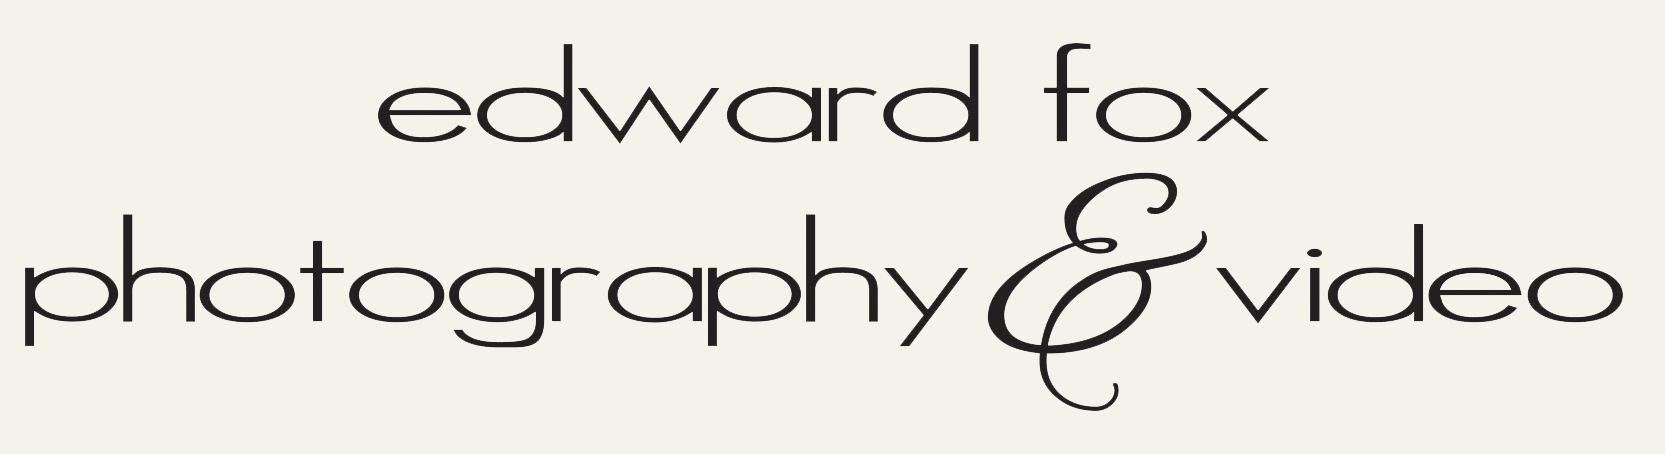 Edward Fox Photography & Video